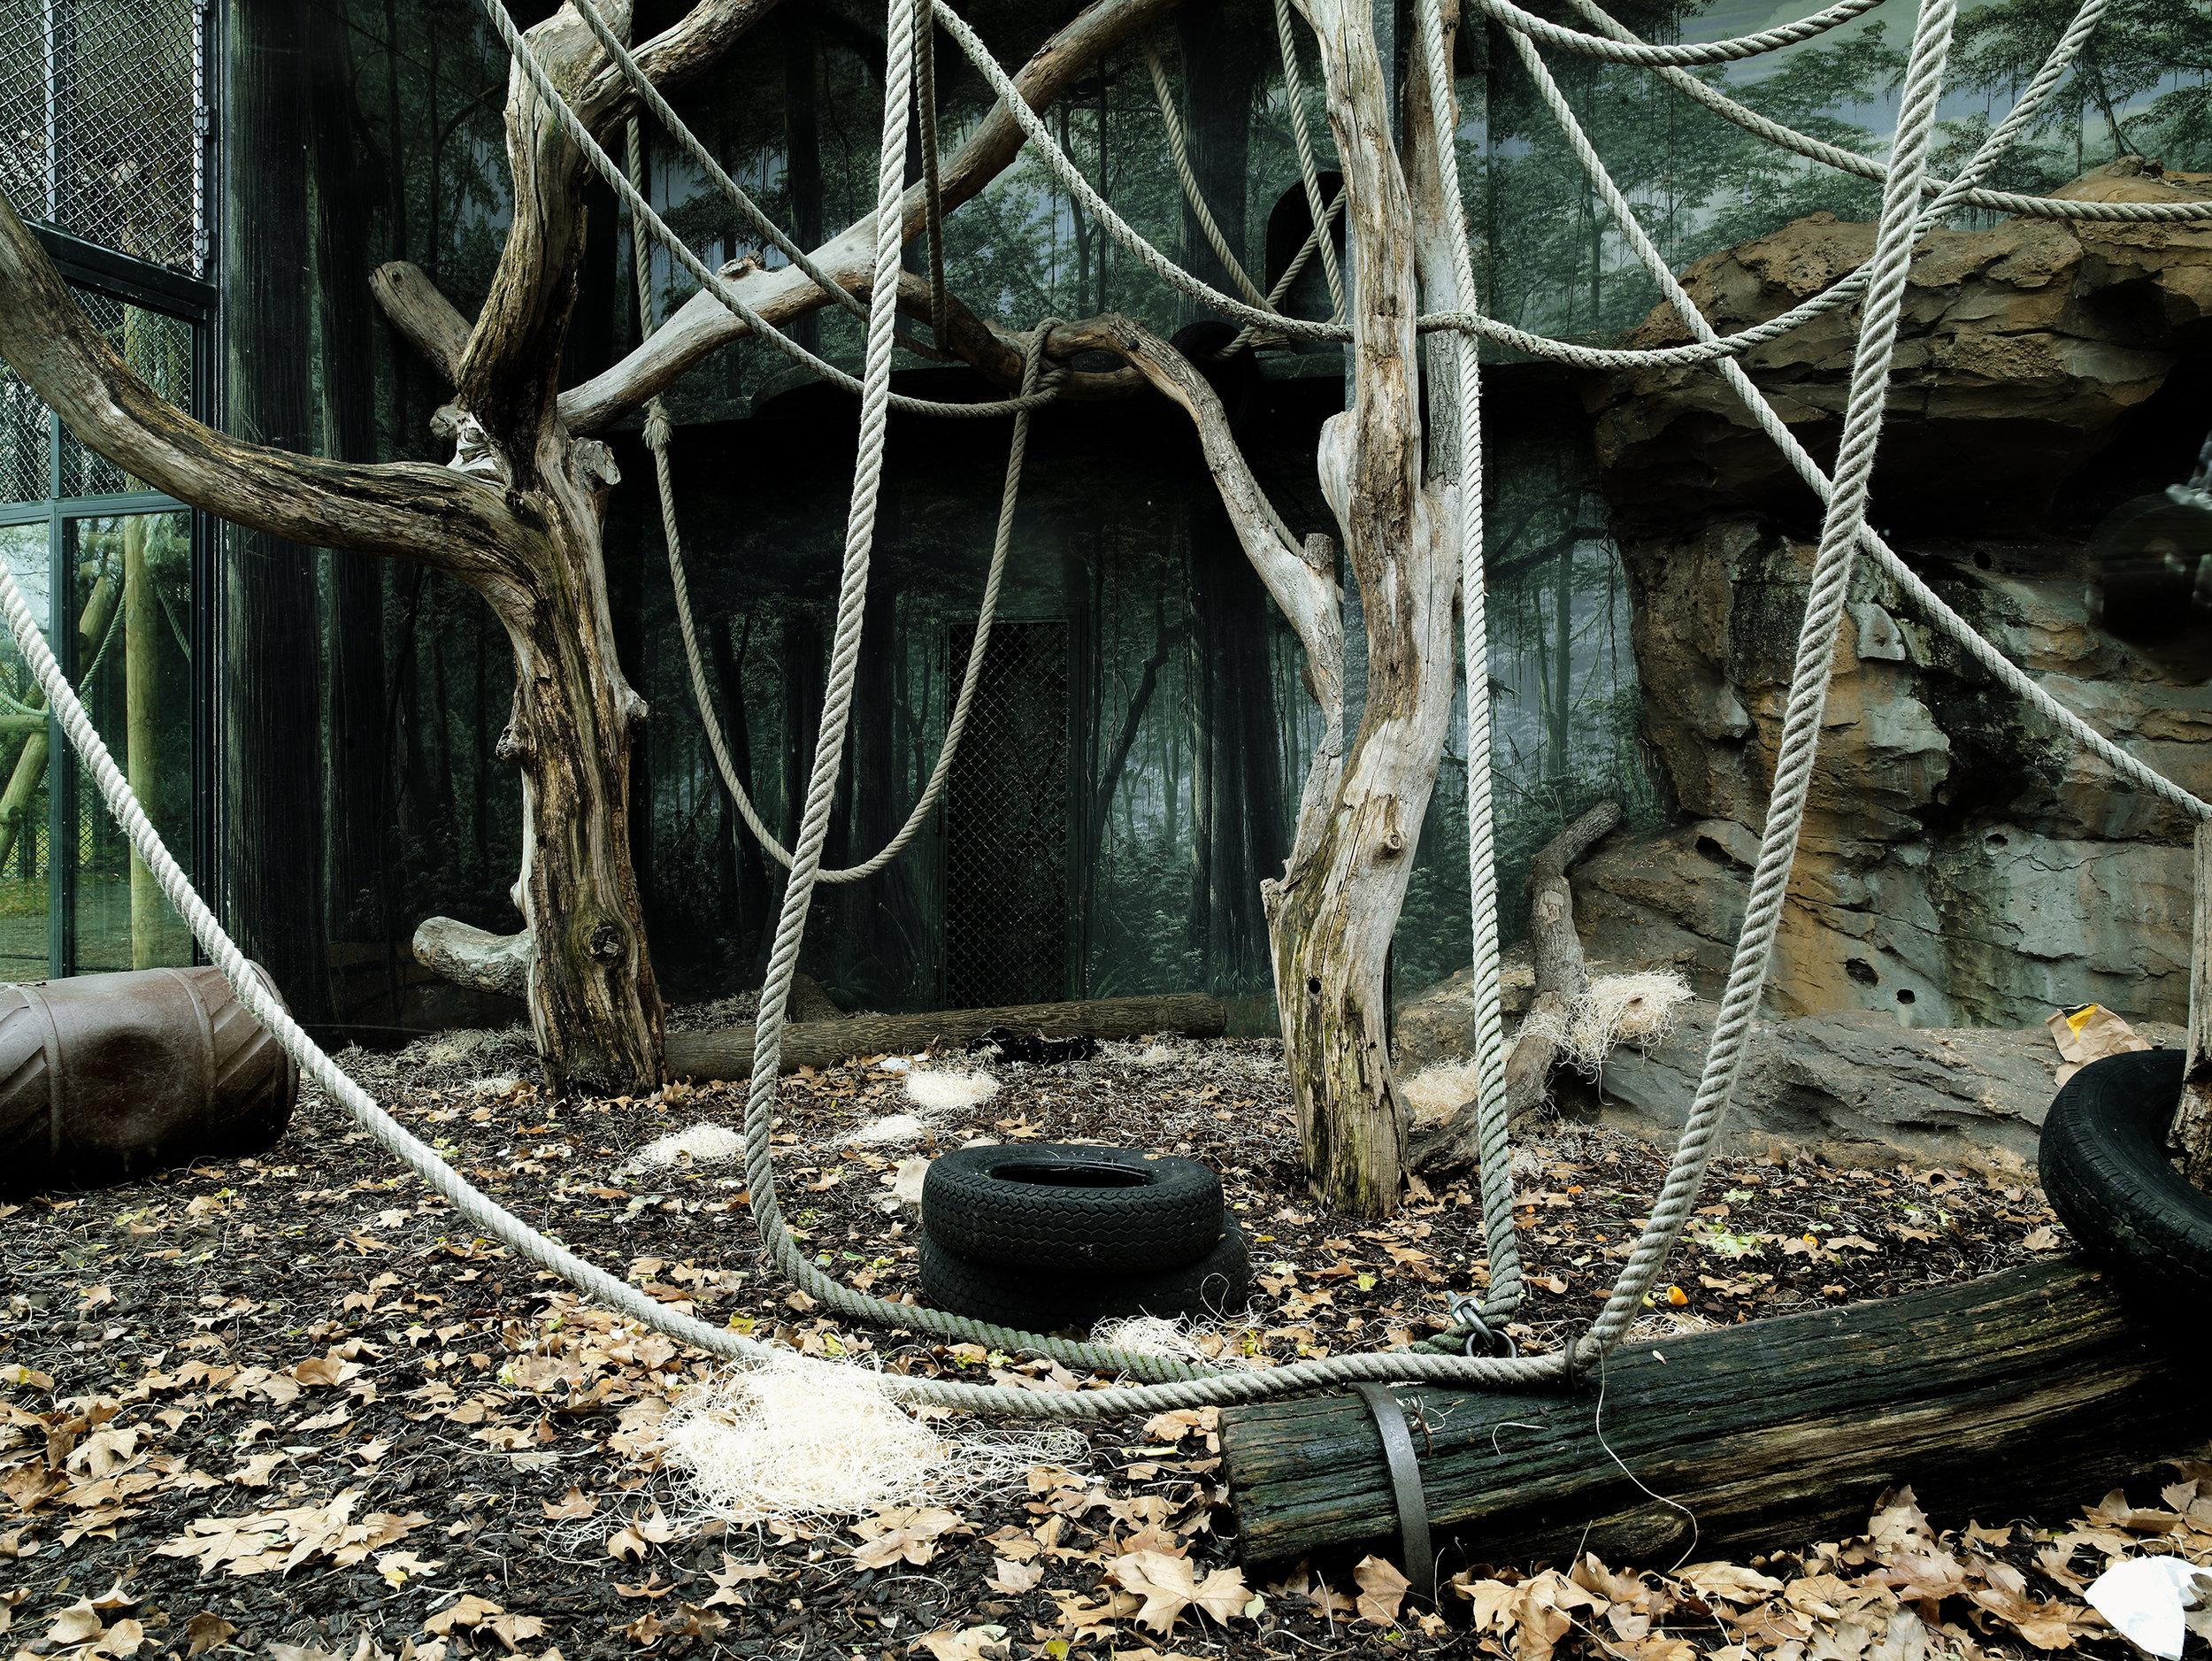 Orangutan cage 2, Jardin des Plantes, France, 2007.